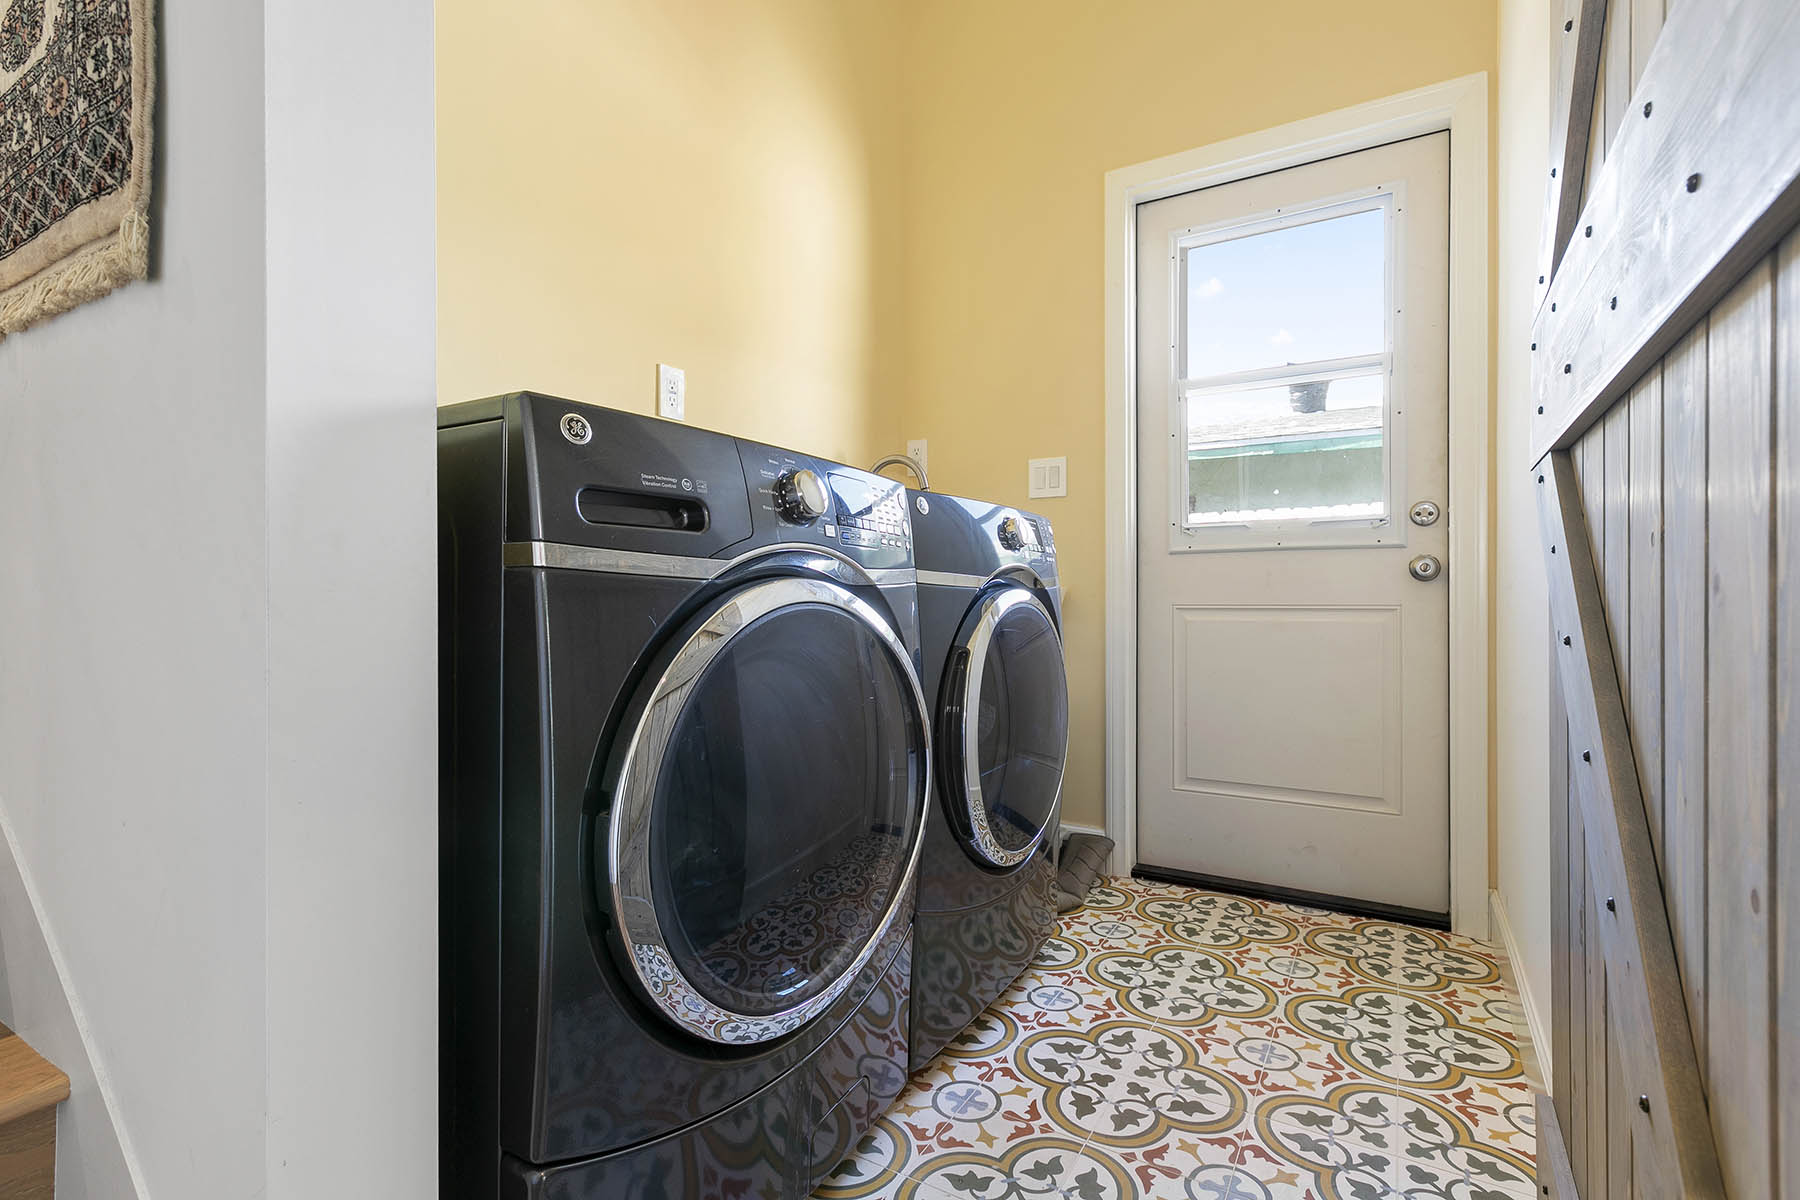 Highland park home addition laundry room websize.jpg